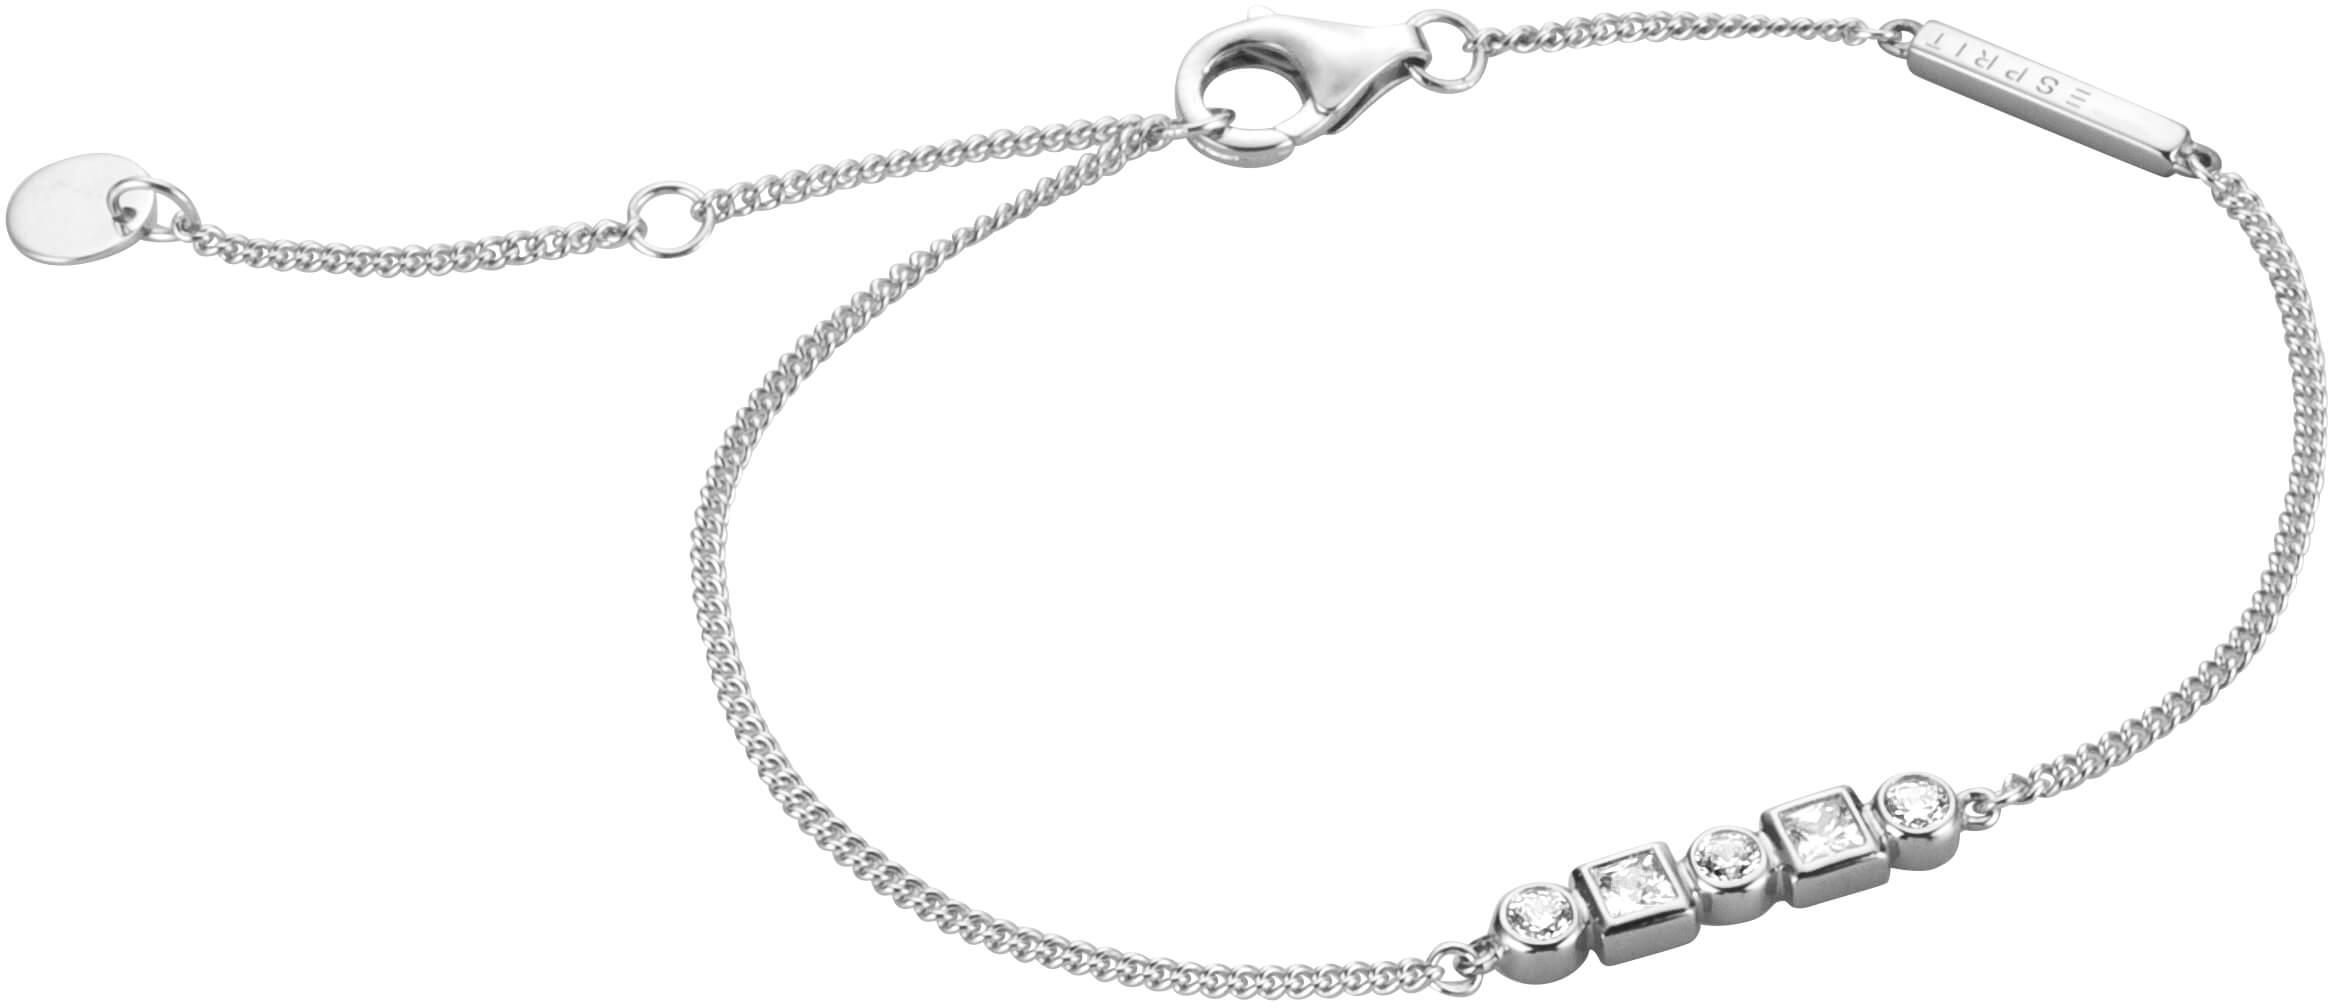 255bdfe483 Esprit Stříbrný náramek s krystaly Flow ESBR00521117 Doprava ZDARMA ...